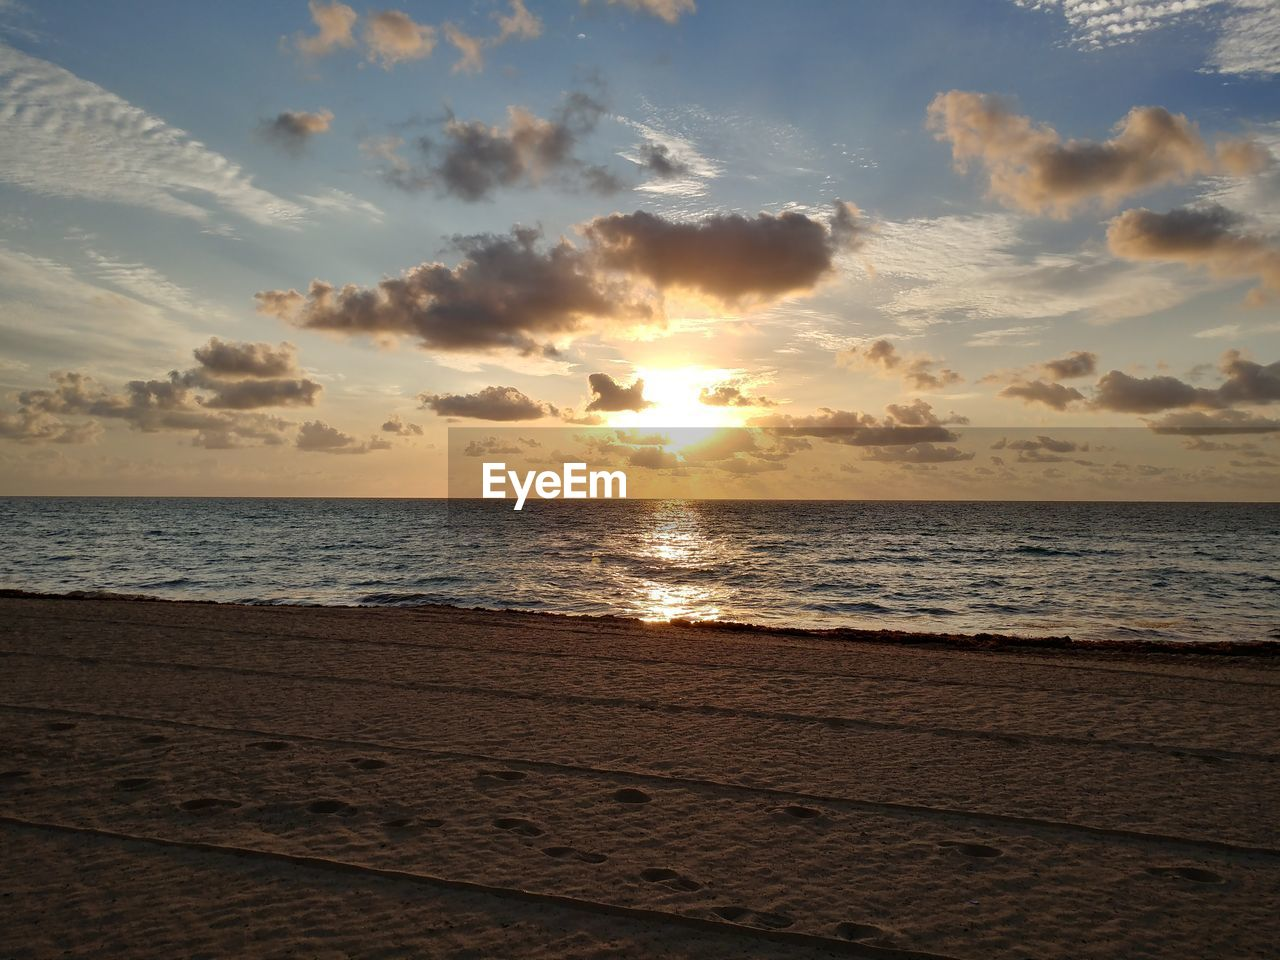 sky, water, sea, sunset, beauty in nature, scenics - nature, land, horizon over water, beach, tranquil scene, tranquility, horizon, cloud - sky, idyllic, sand, nature, sunlight, sun, outdoors, no people